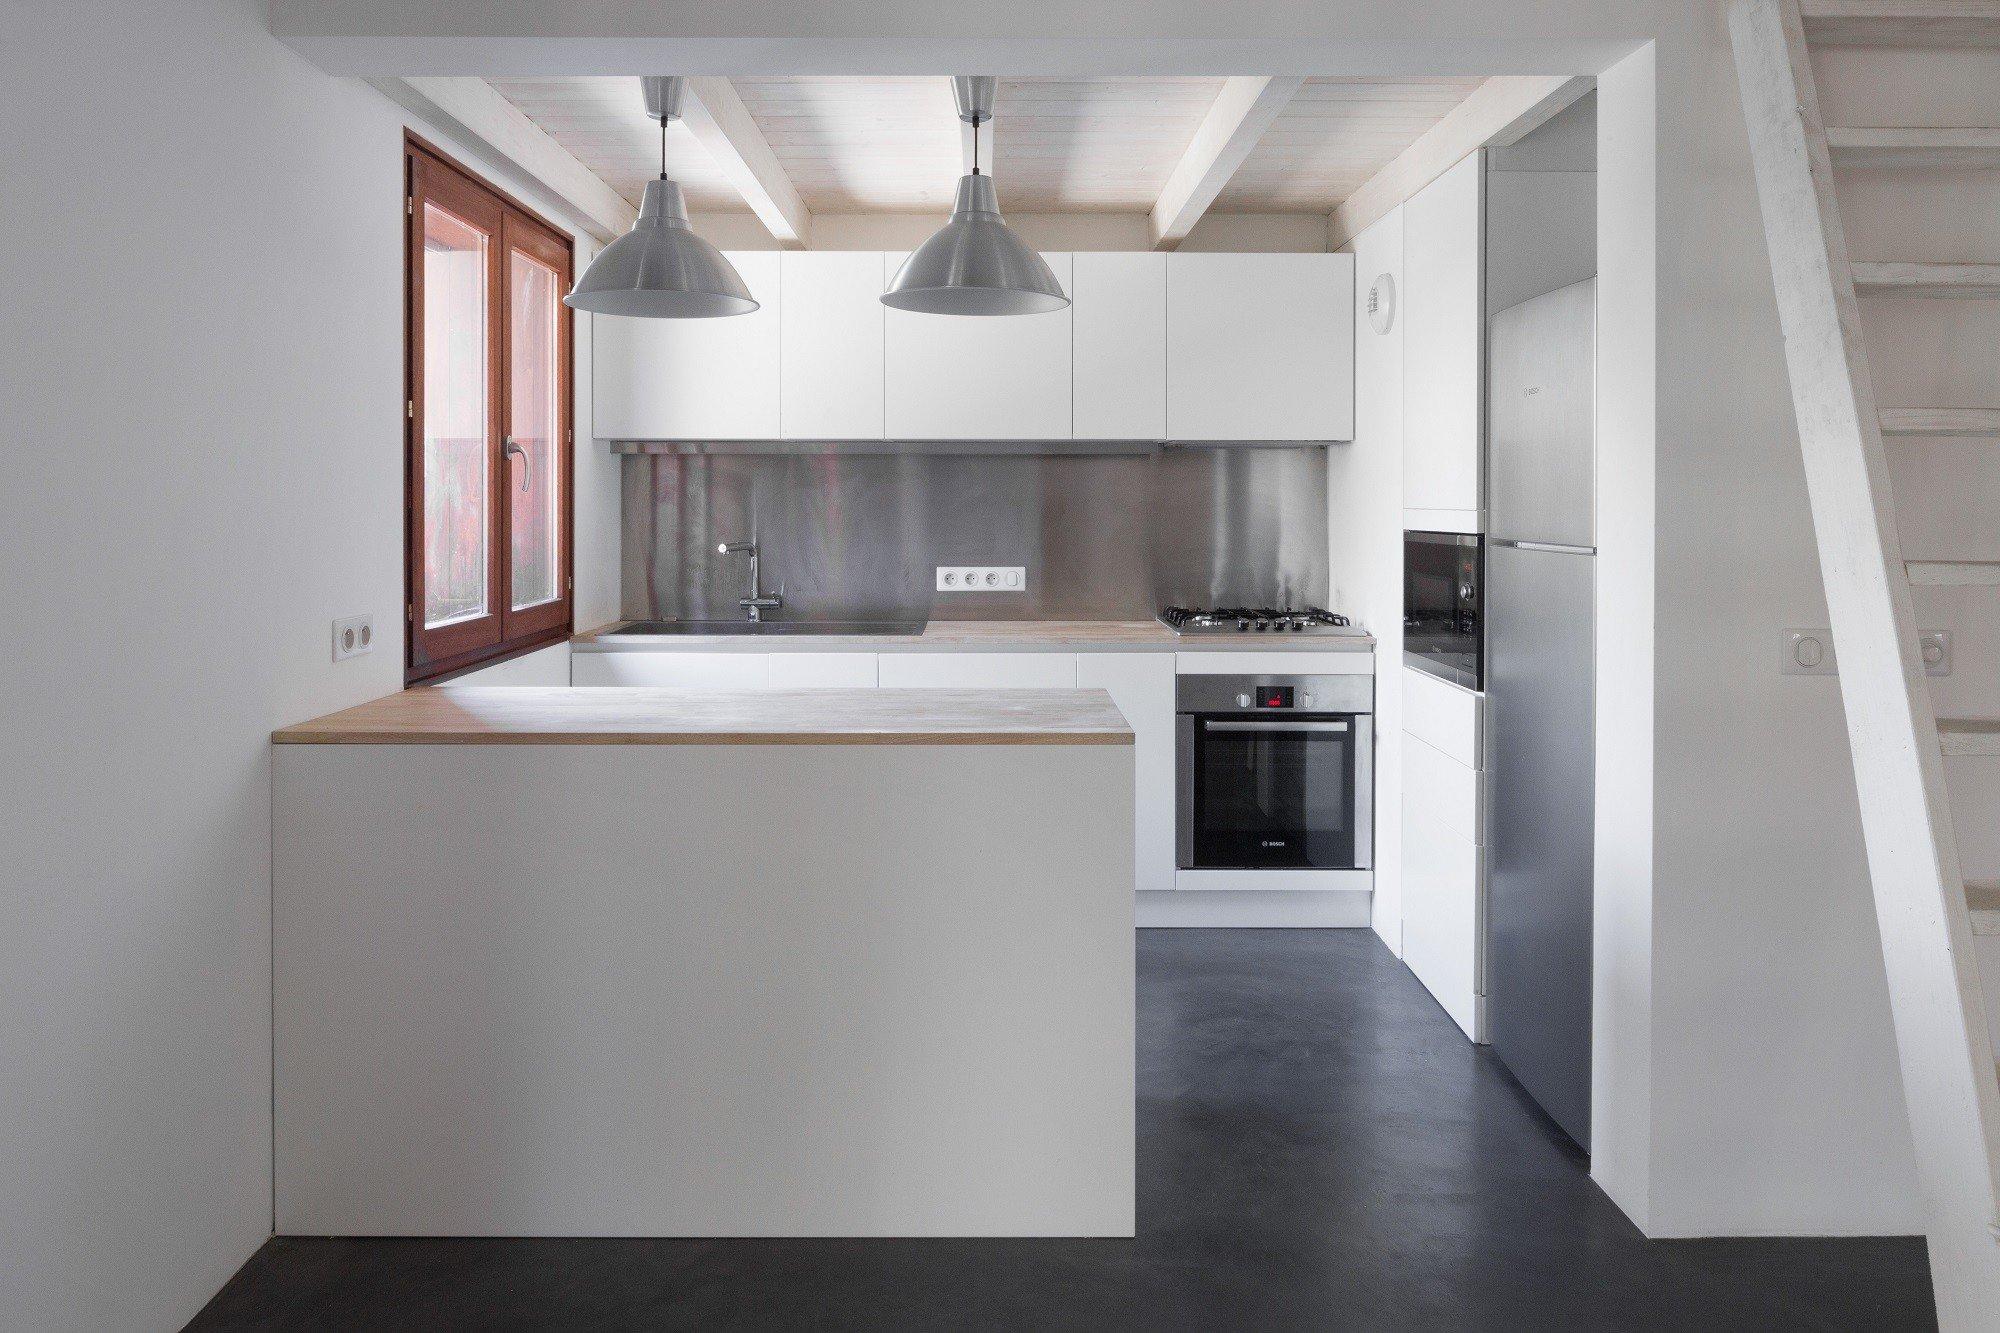 Ferienhaus contemporary vernacular in Conca   Bad und Sanitär ...